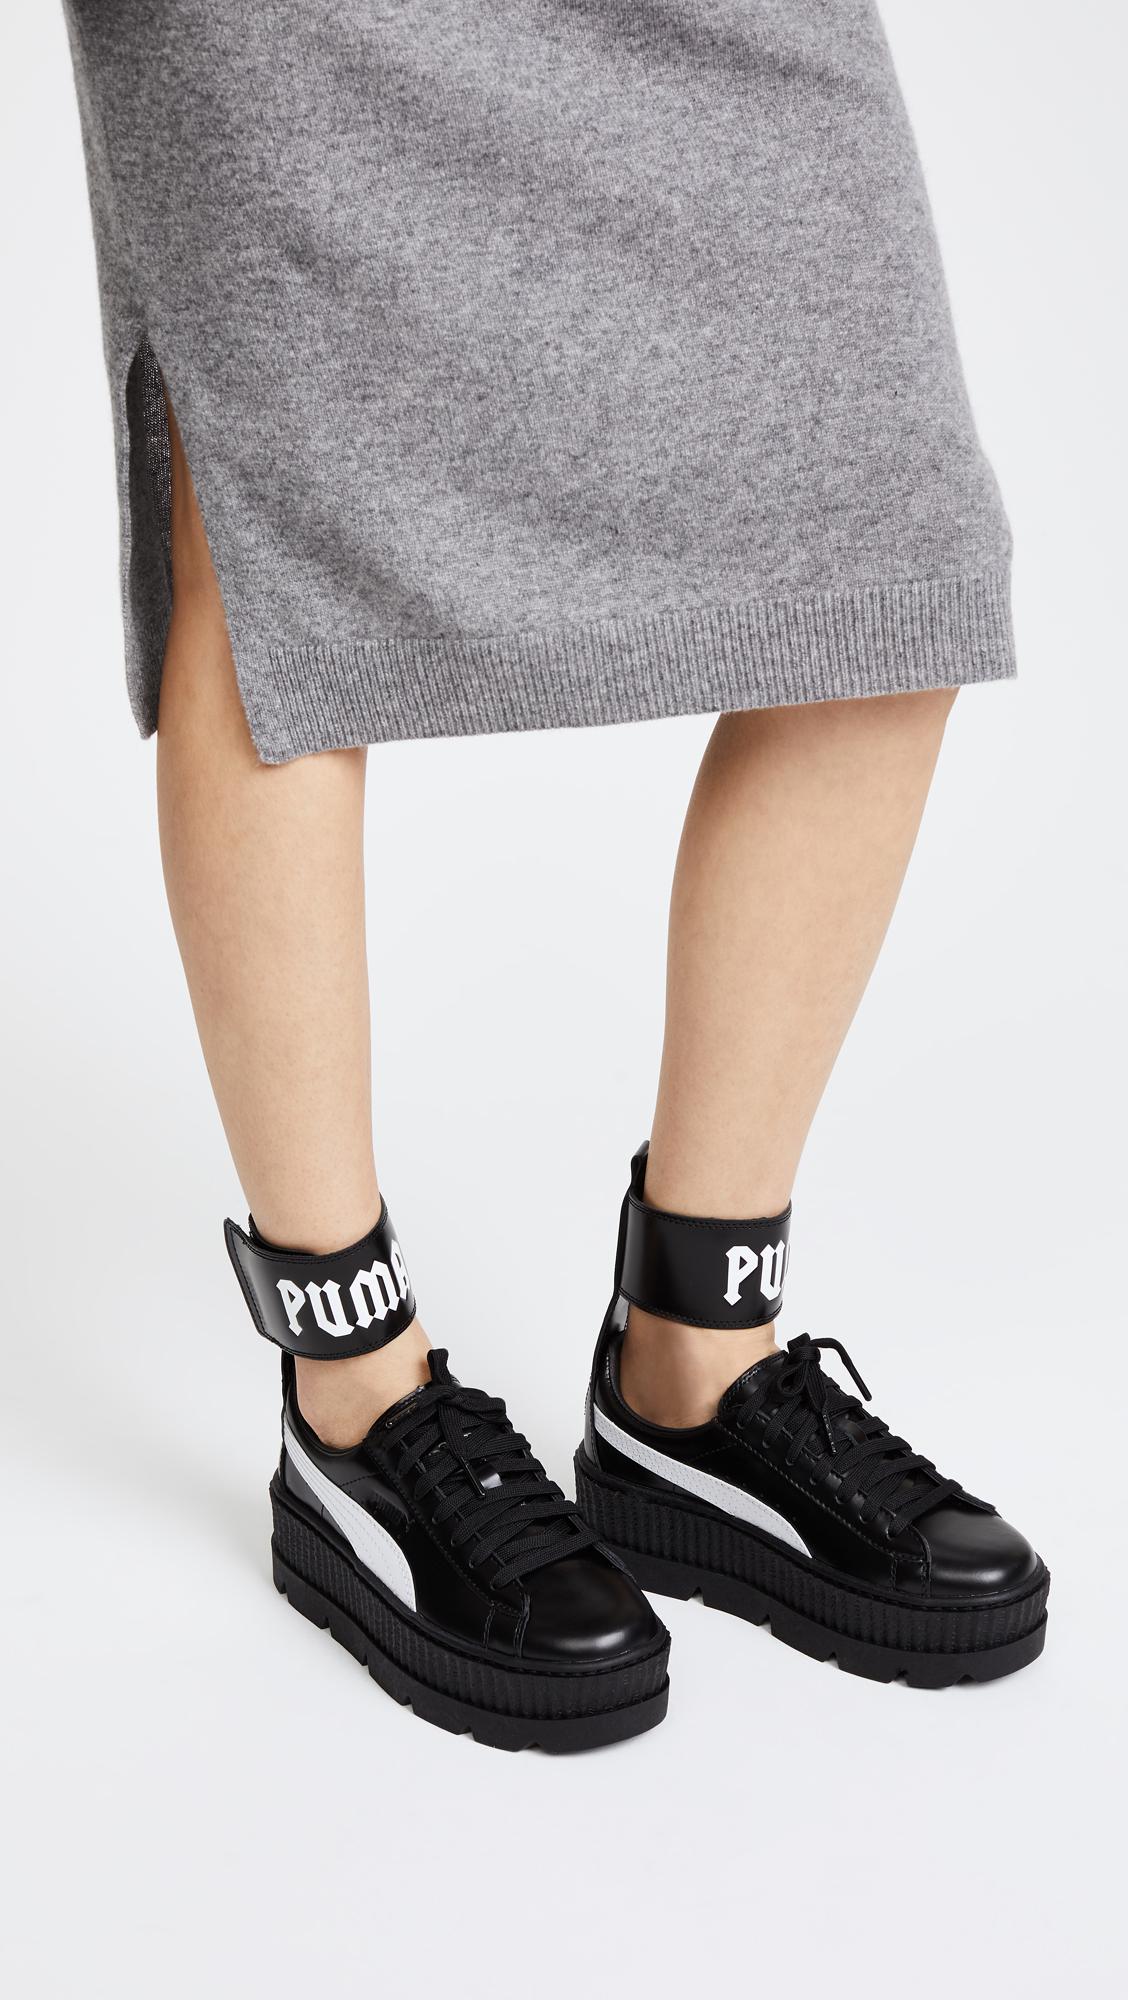 3166fb4bed9f PUMA FENTY x PUMA Ankle Strap Sneakers